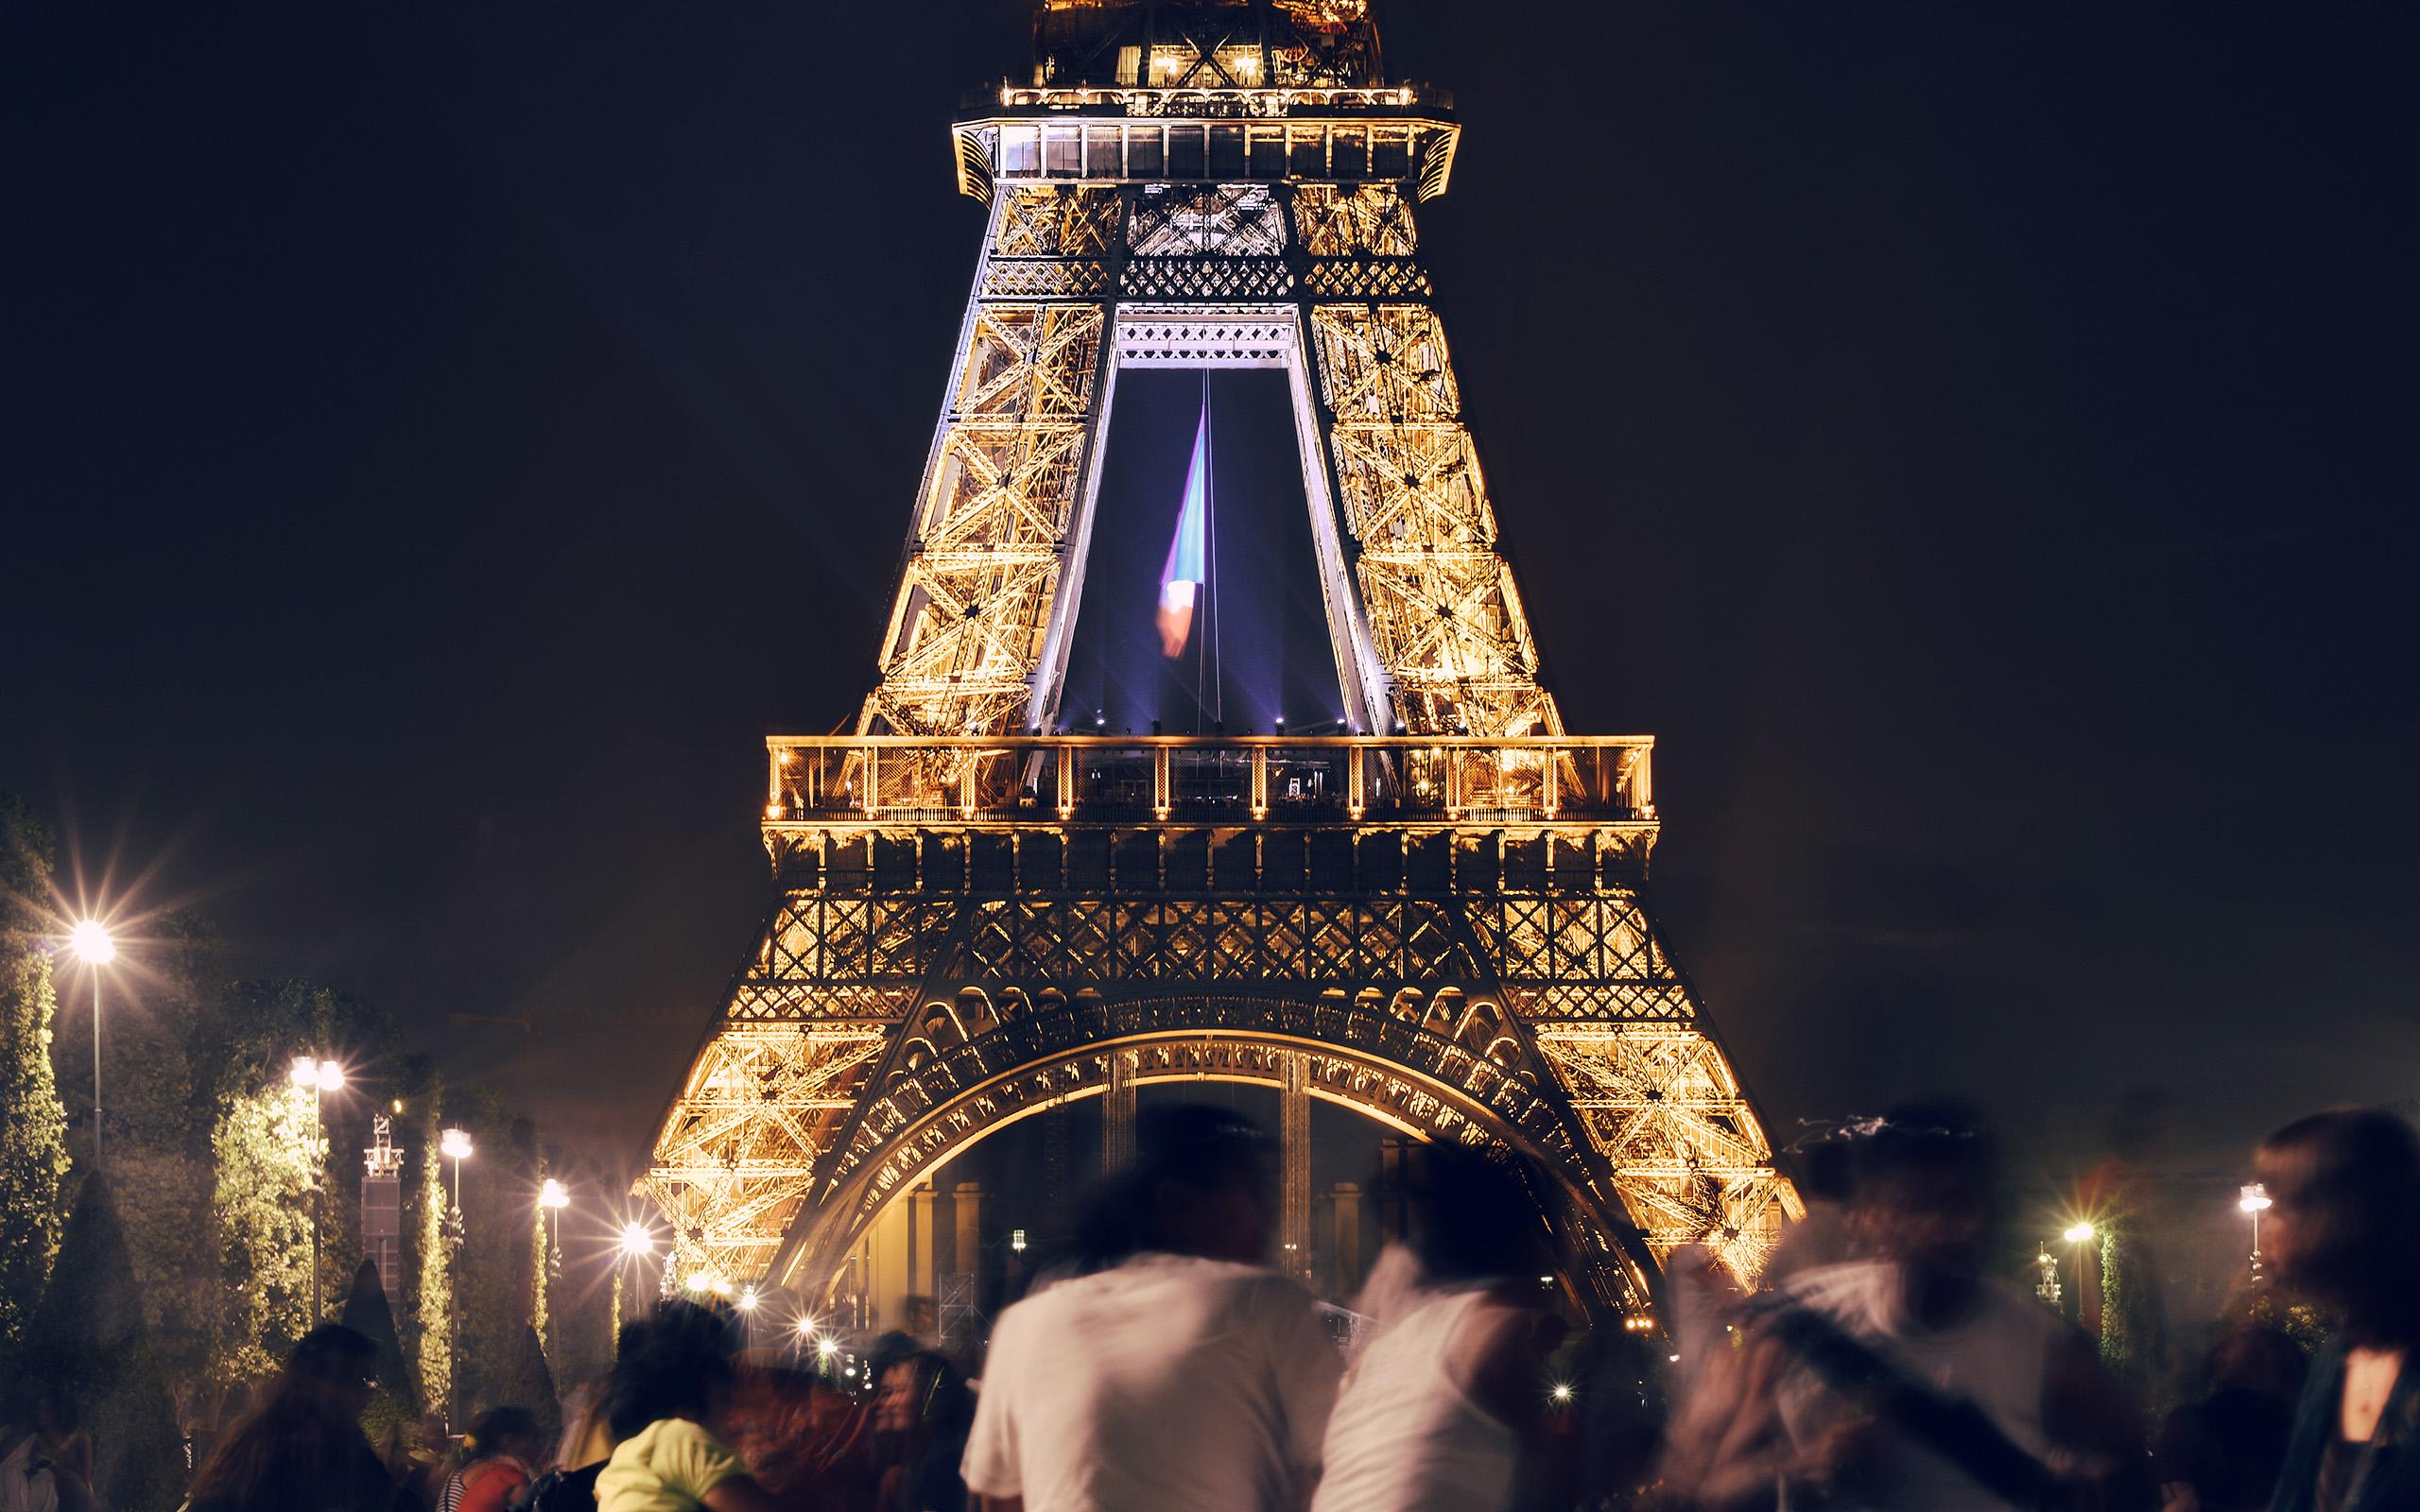 Fall Sunset Anime Wallpaper Ms39 Happy Paris Eiffel Tower France Tour Night City Dark